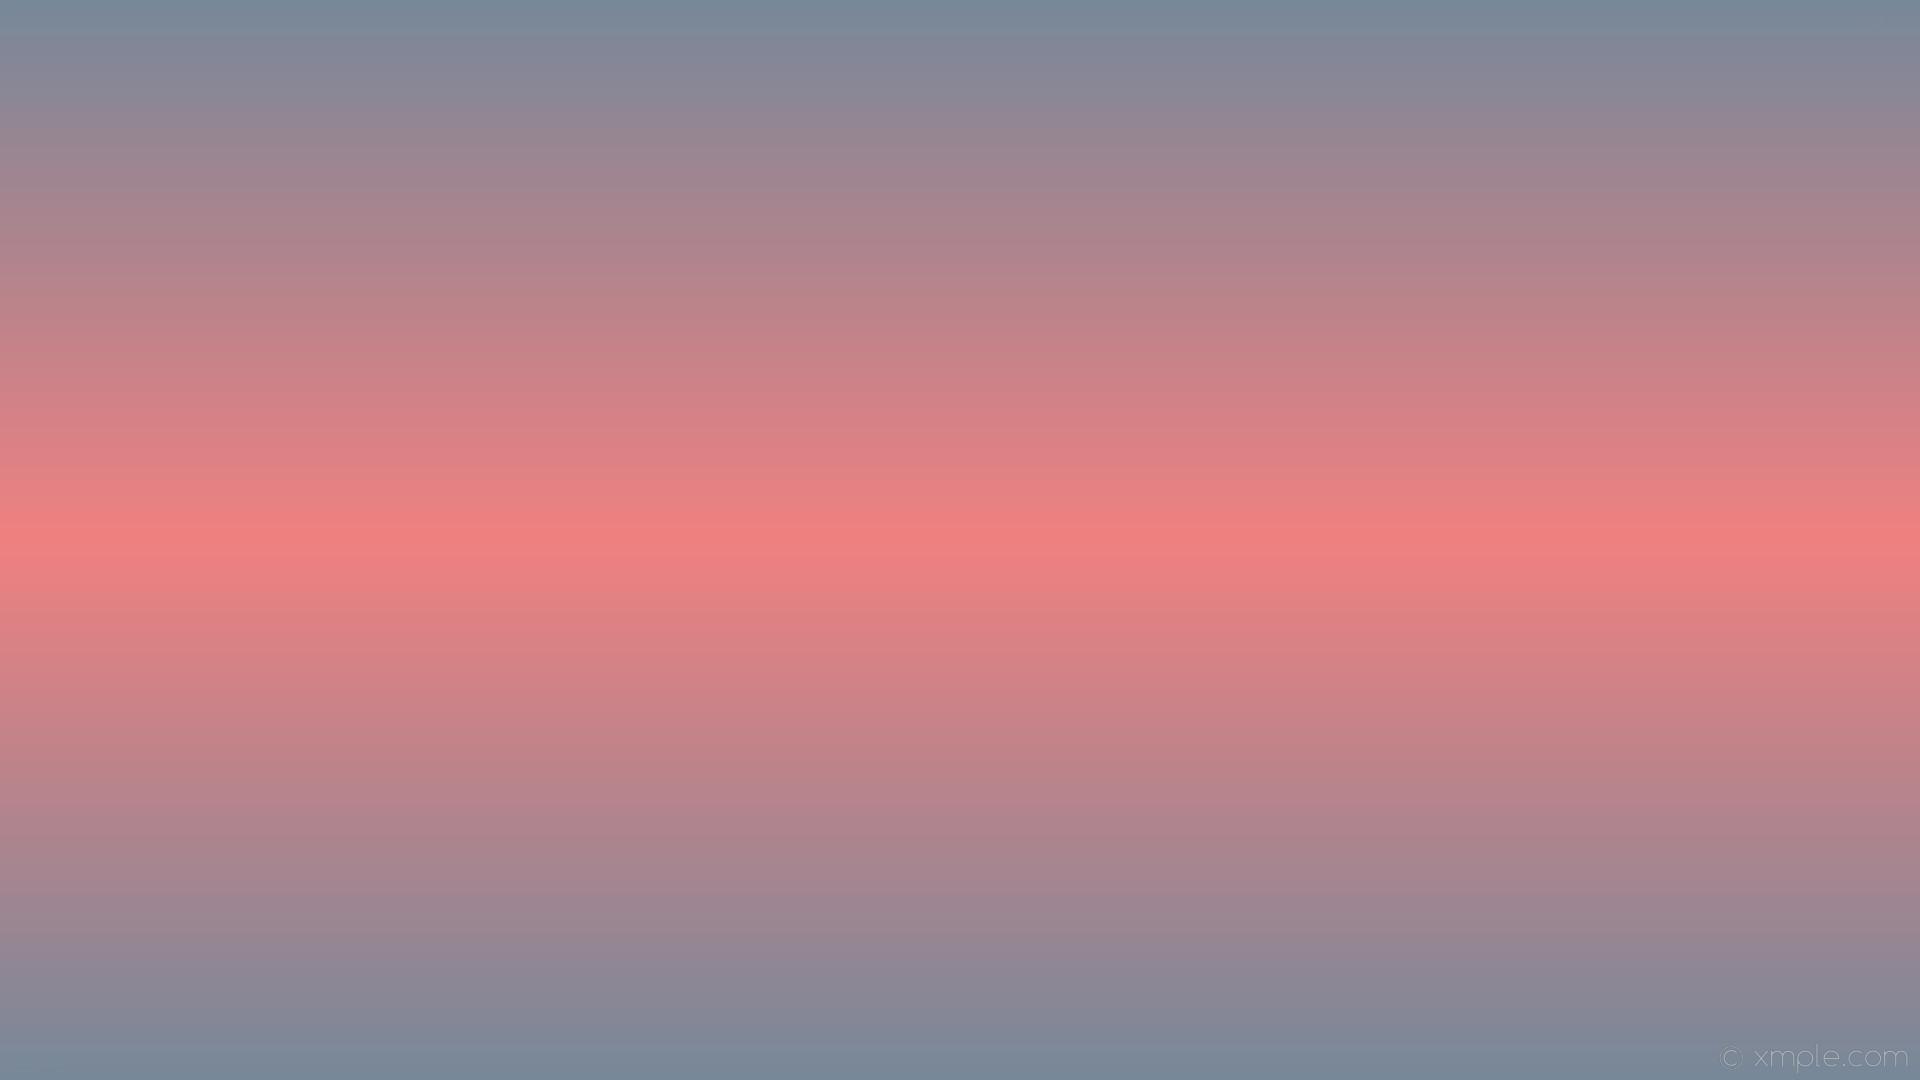 wallpaper linear gradient highlight red grey light slate gray light coral  #778899 #f08080 90